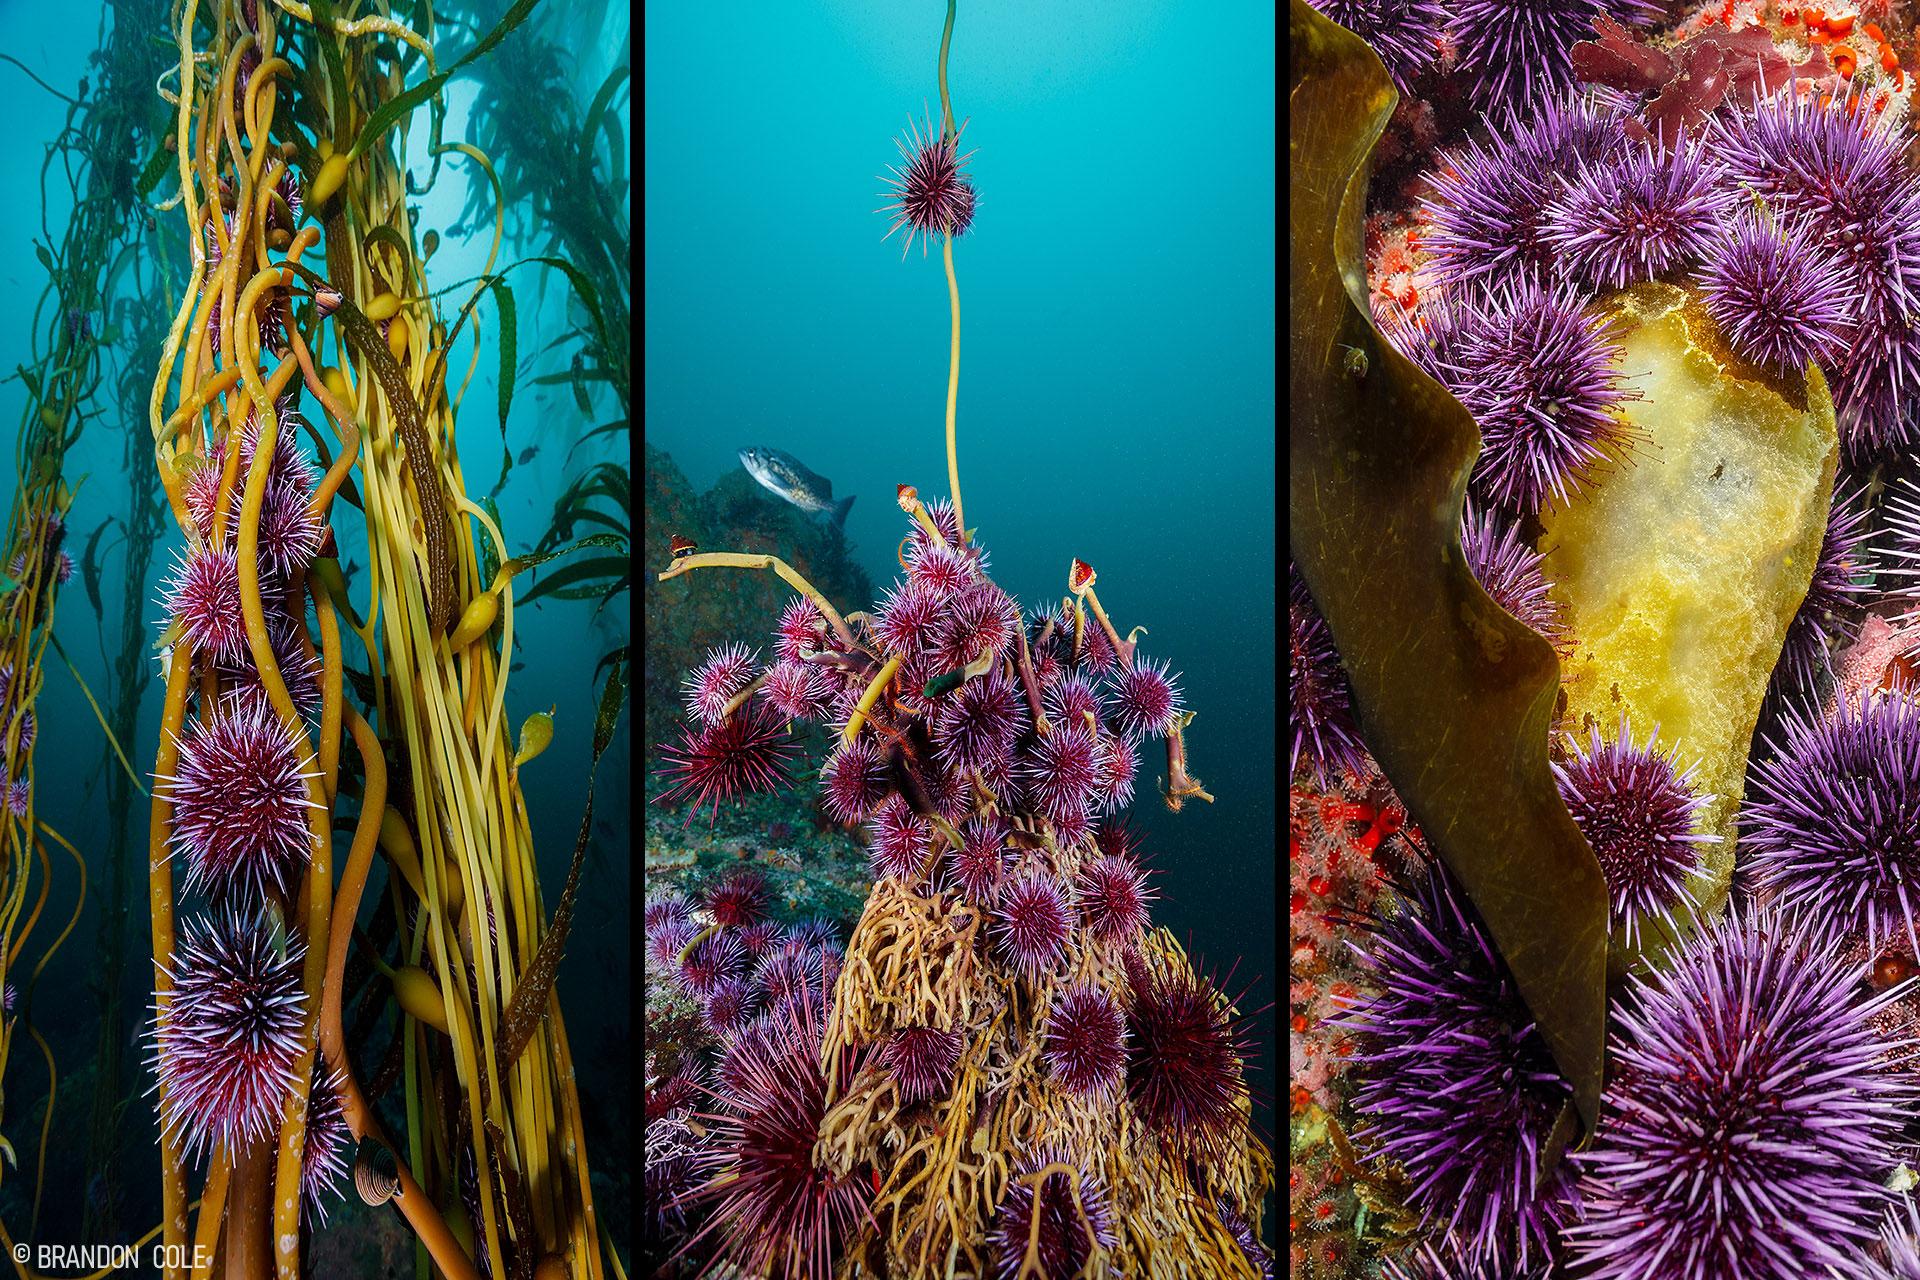 Purple sea urchins devour kelp.